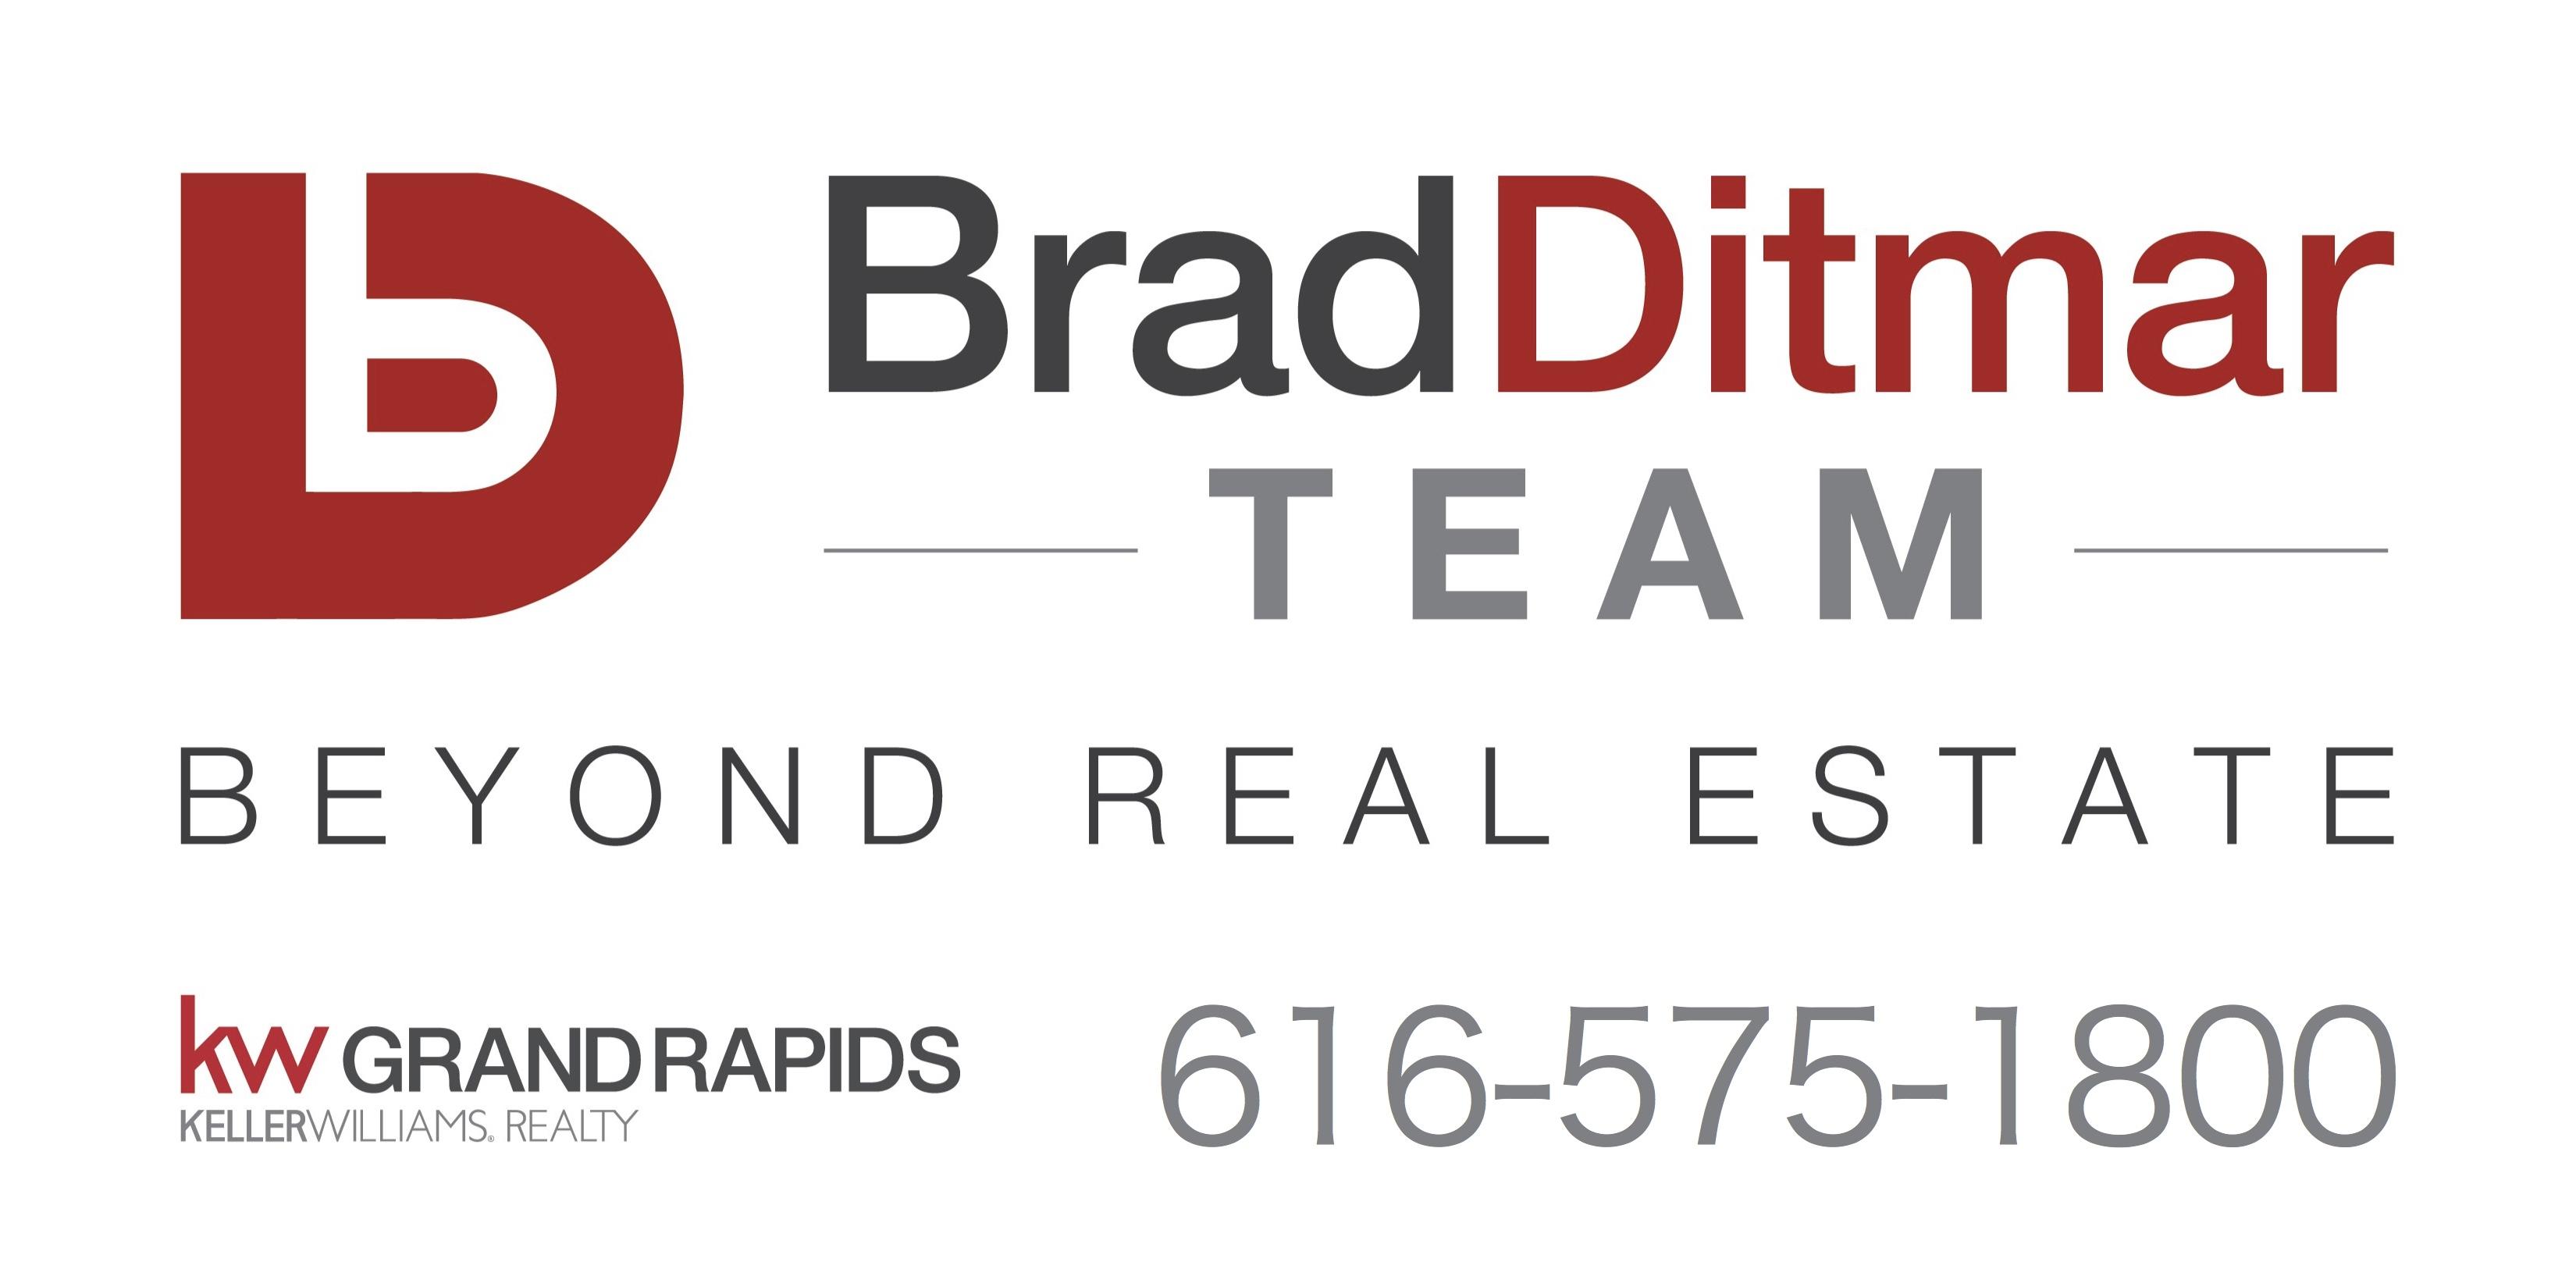 The Brad Ditmar Team